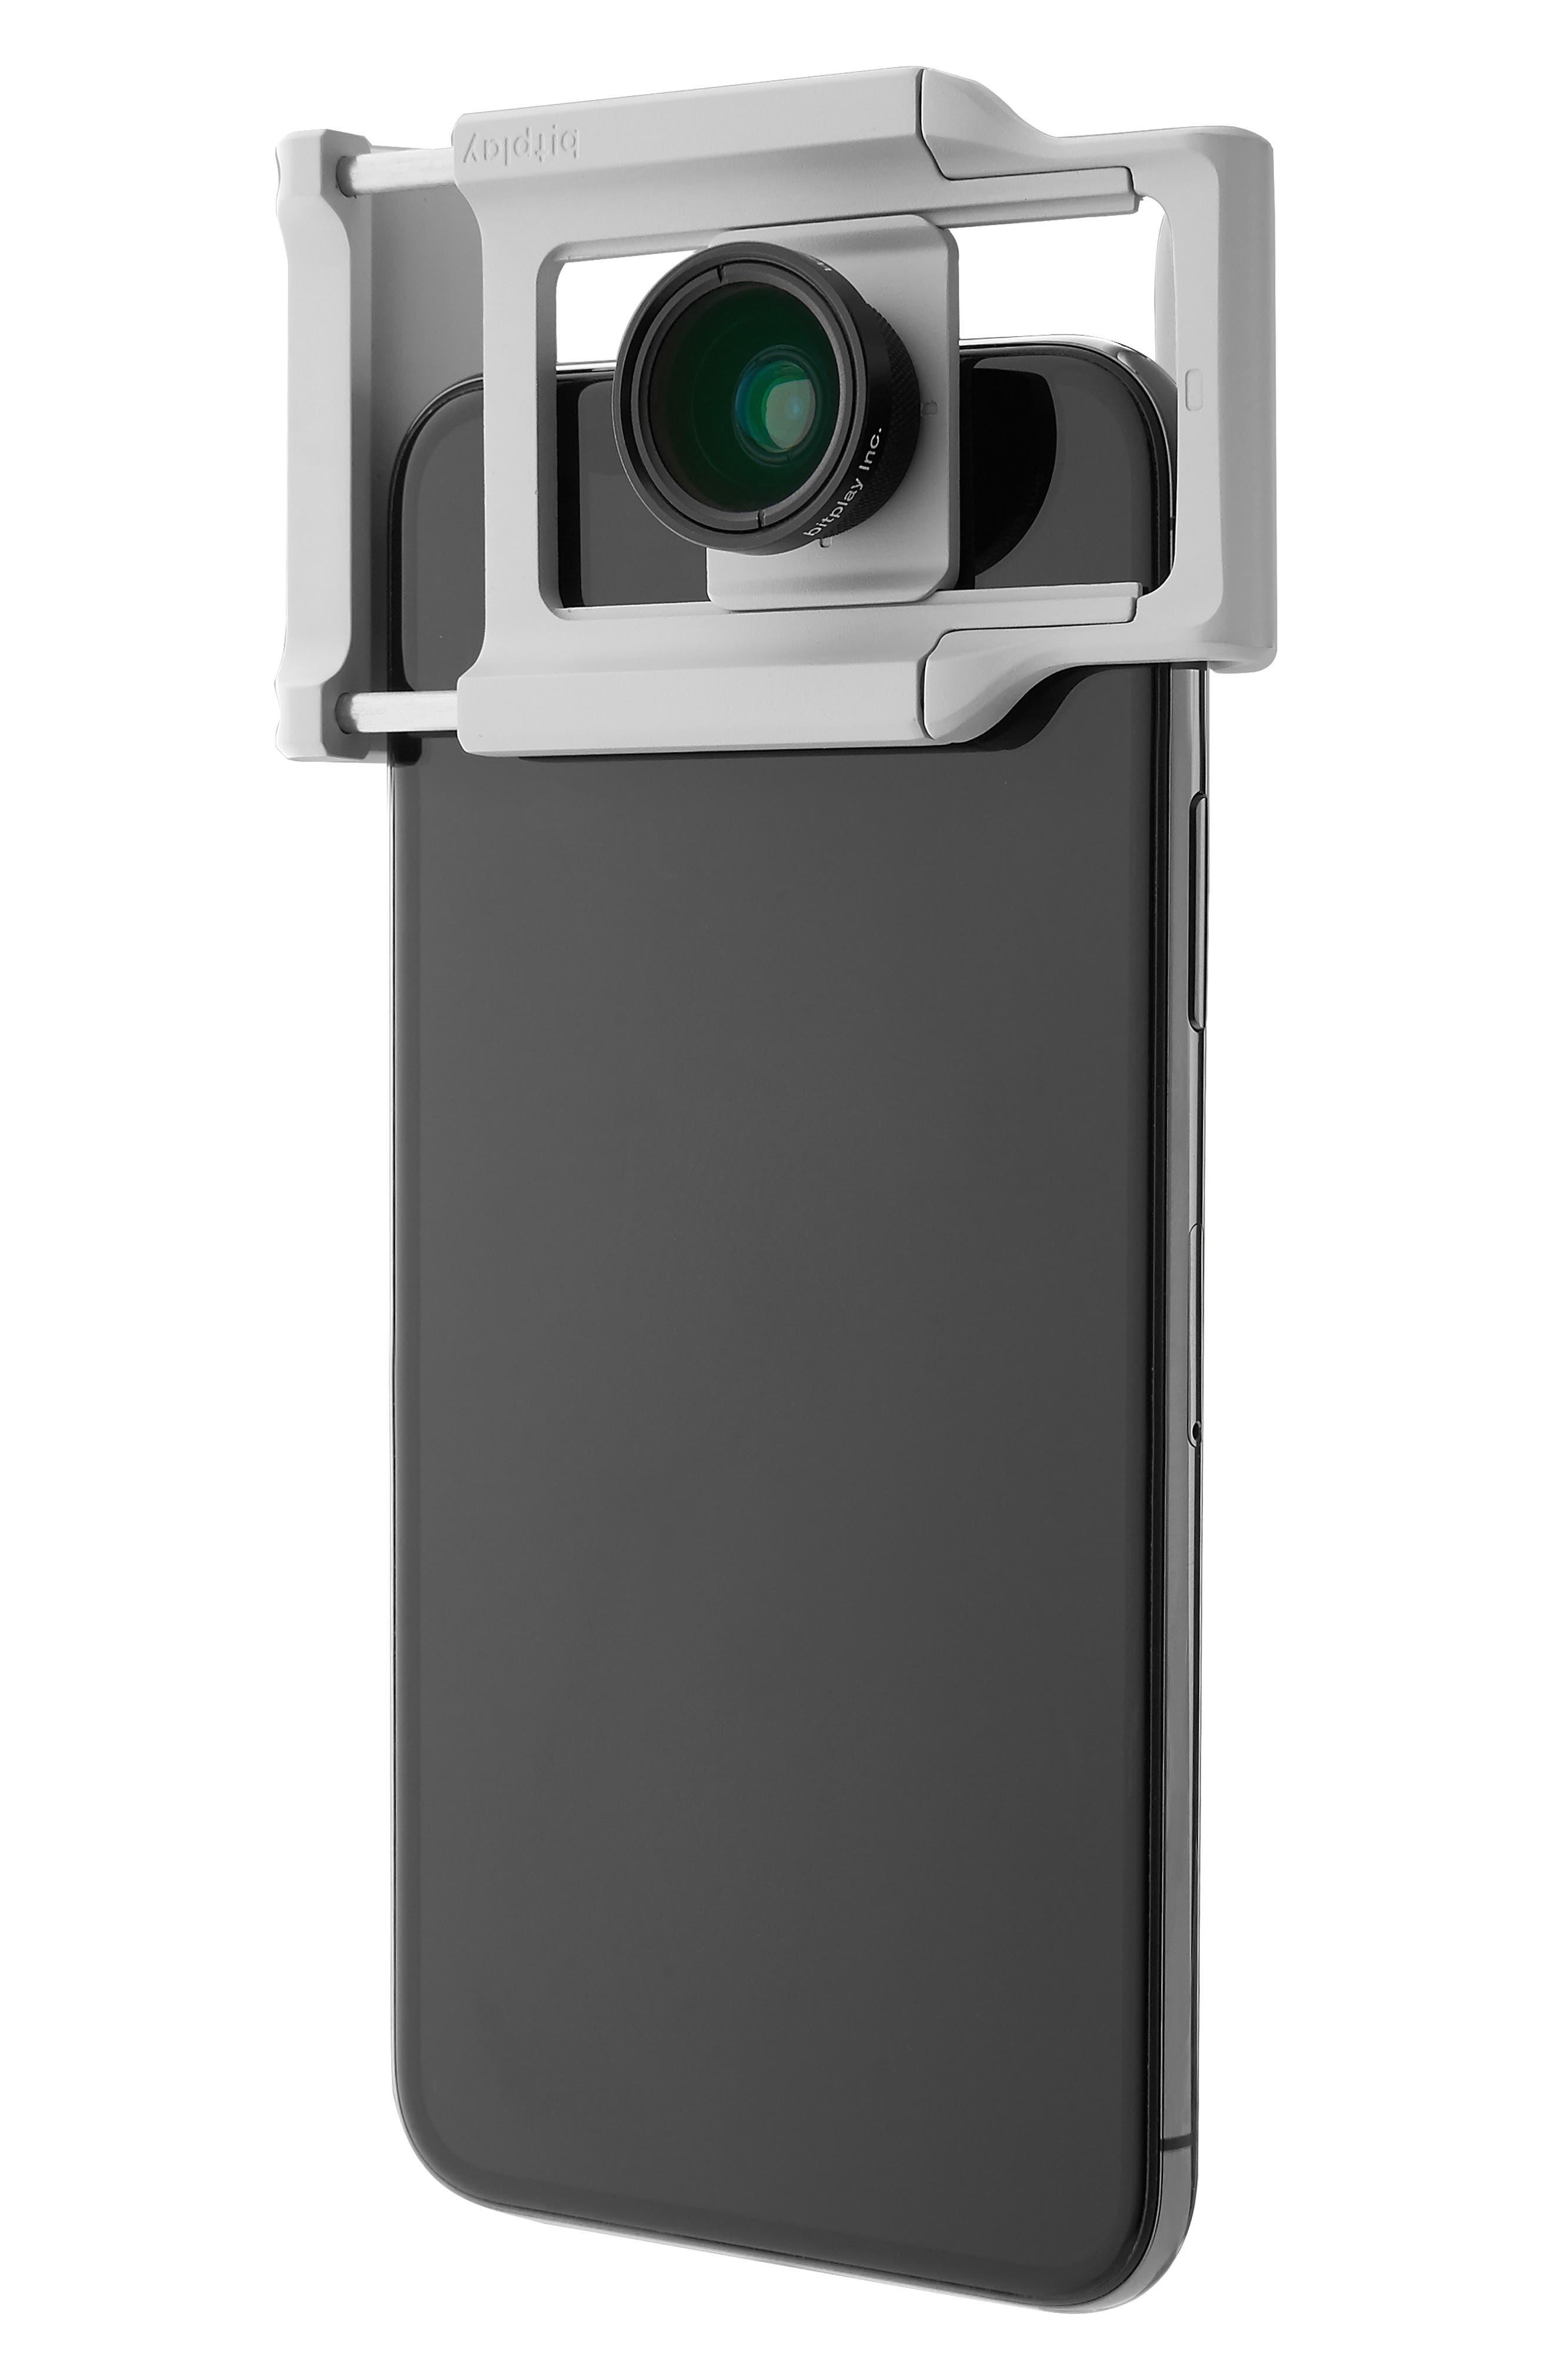 AllClip Lens Holder + Wide Angle Lens,                             Alternate thumbnail 2, color,                             SILVER